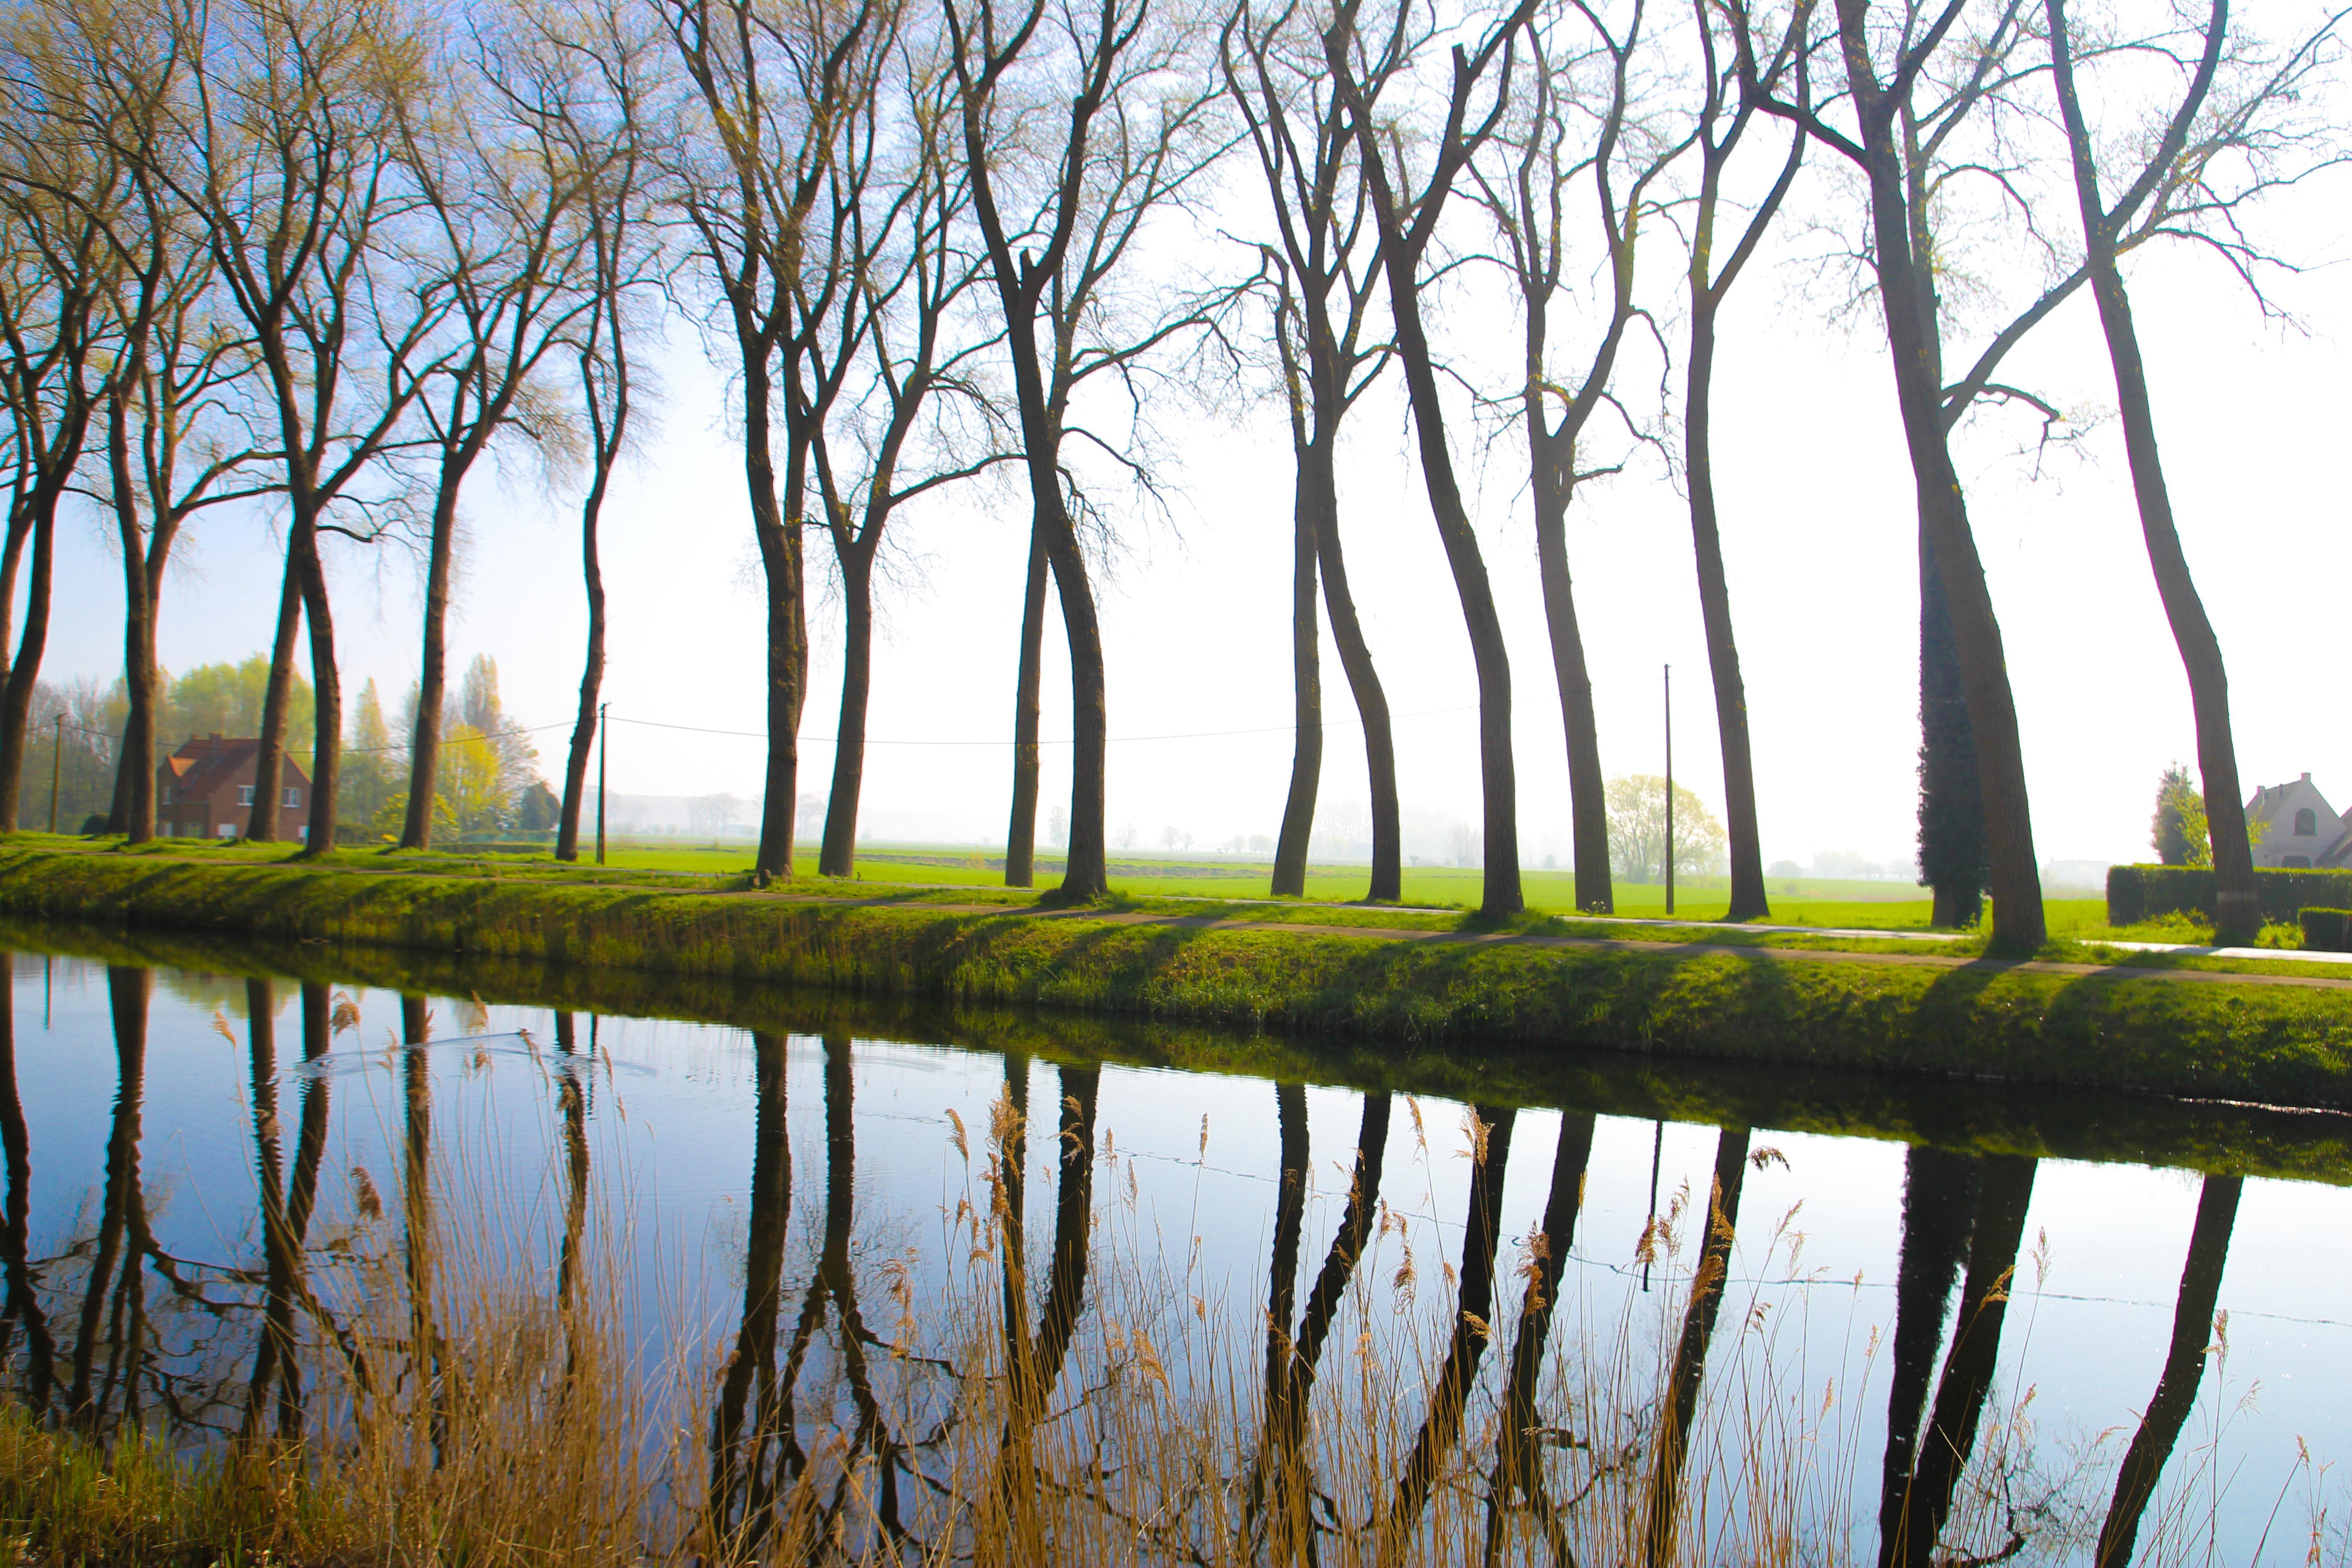 Canal de damme - balade velo Bruges damme